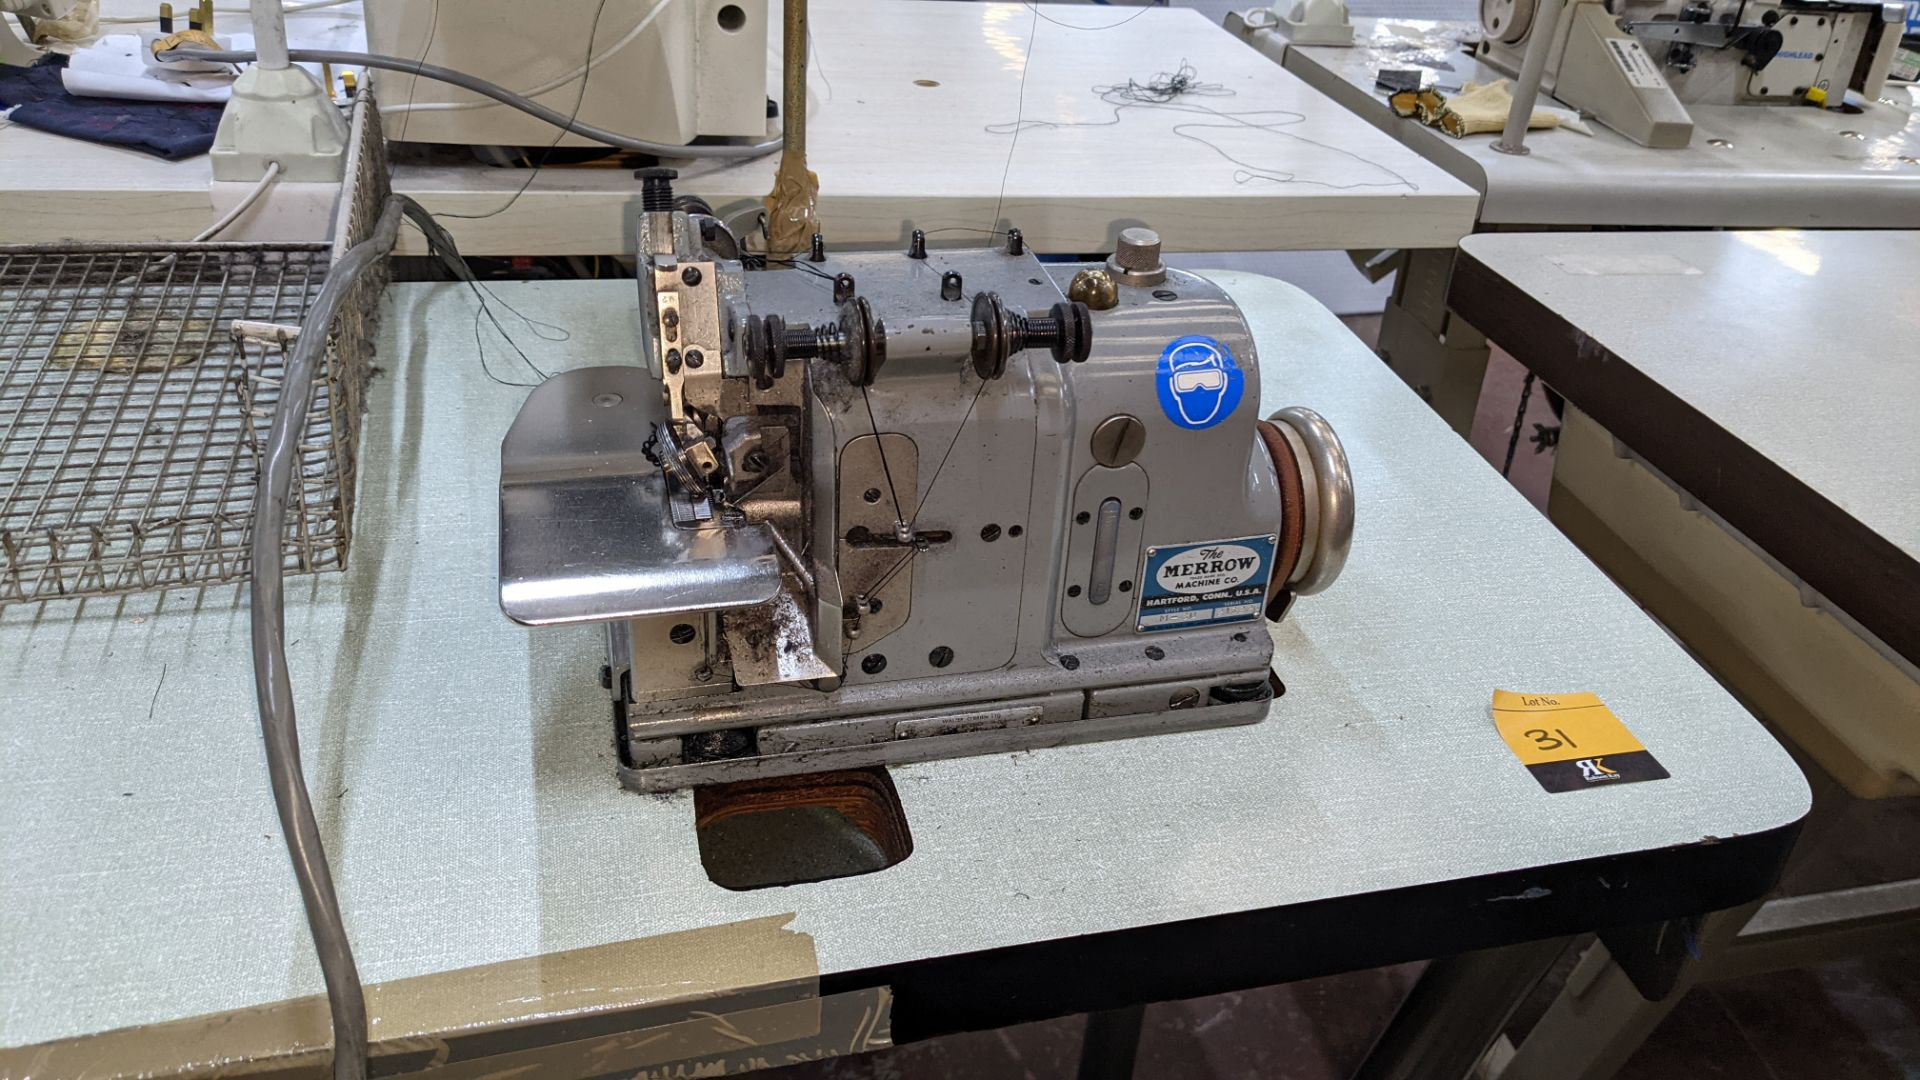 Merrow sewing machine, model M-30 - Image 6 of 14